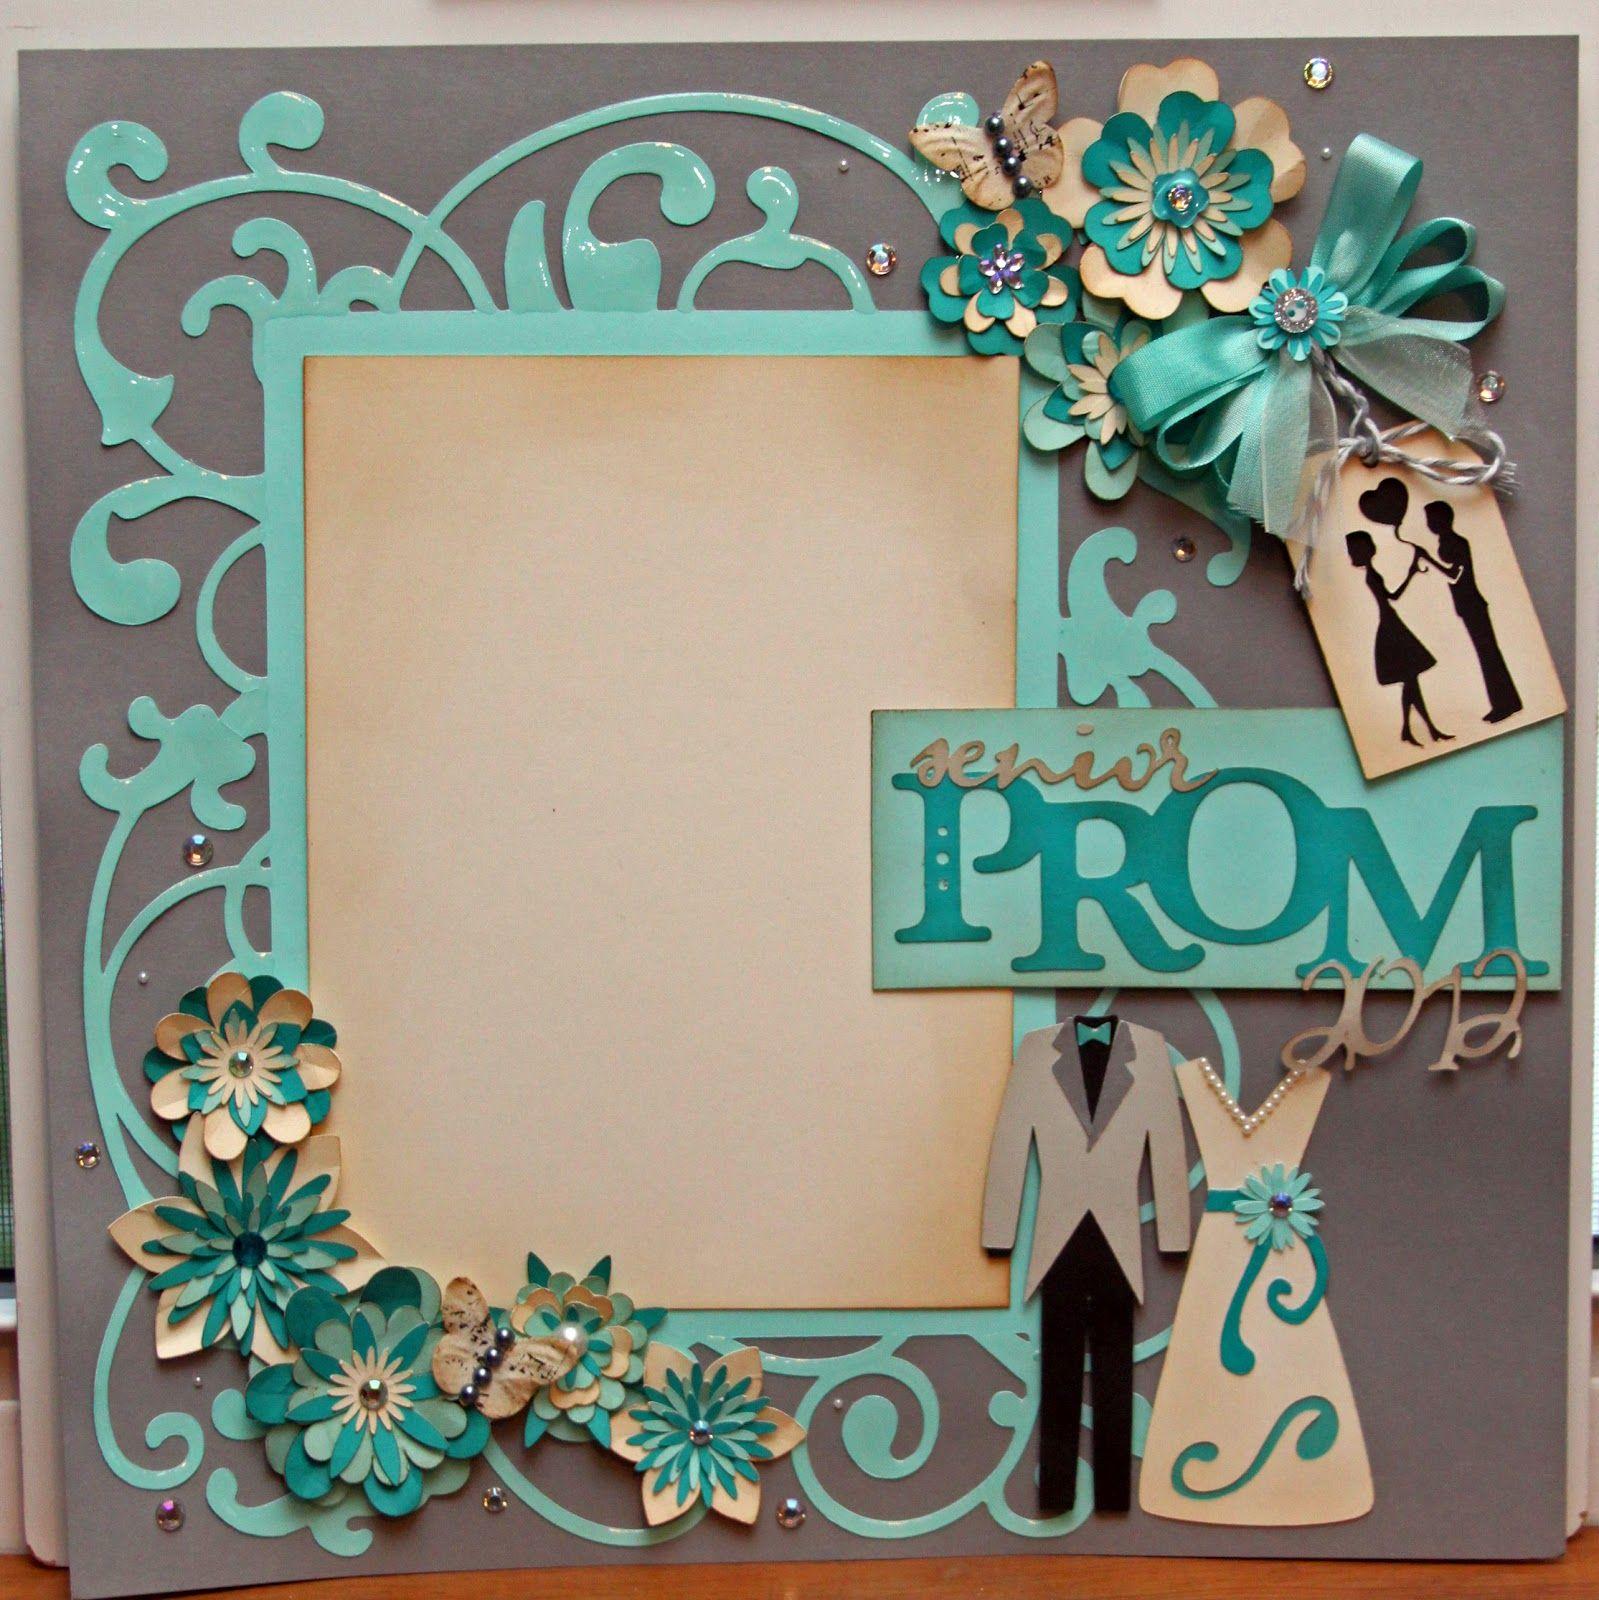 Wedding scrapbook ideas using cricut - Fantabulous Cricut Challenge Me Monday 111 Wedding Scrapbook Layoutsschool